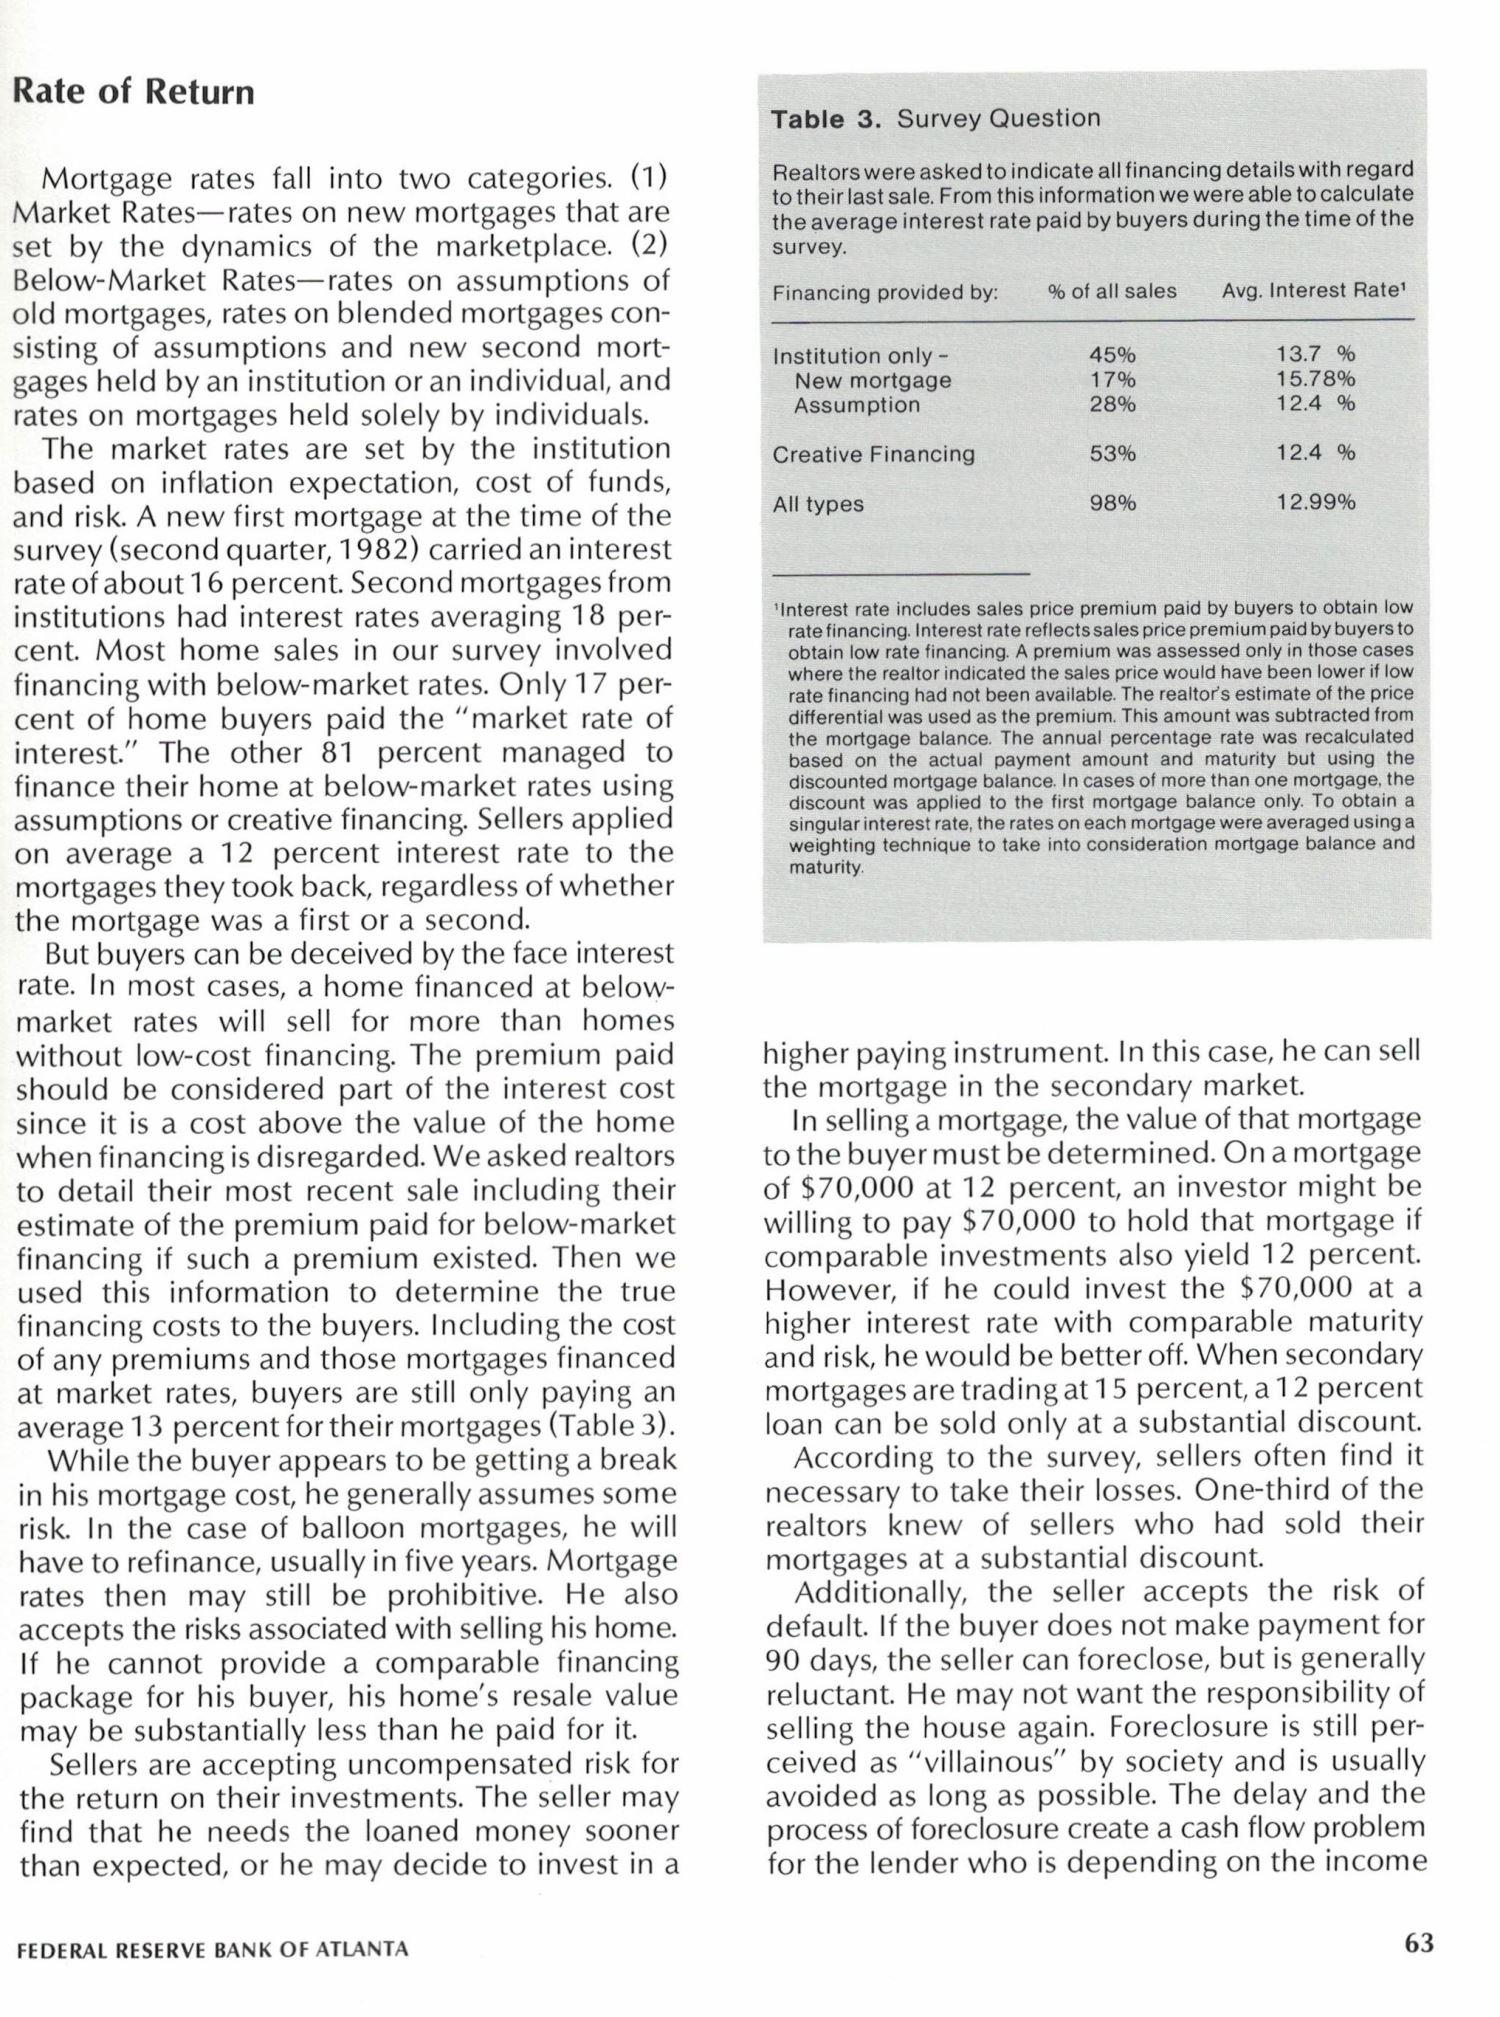 Risks-of-Creative-Financing-7.jpg